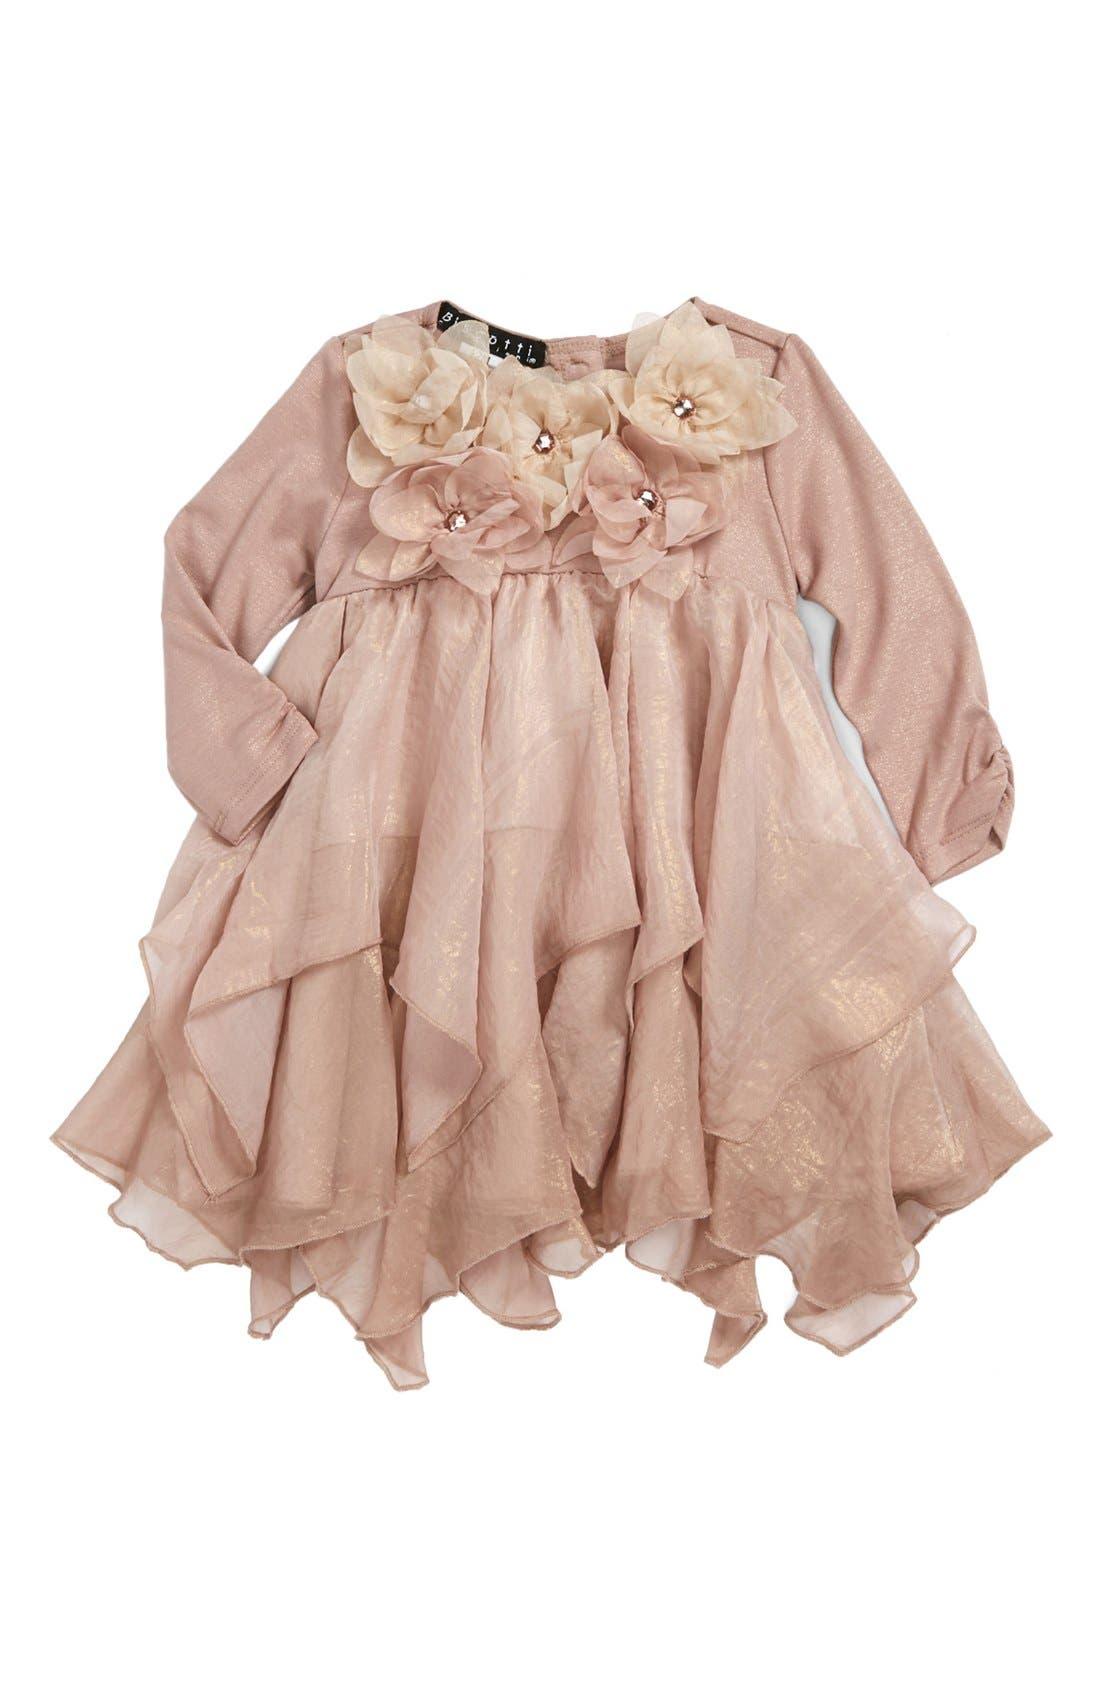 Ruffle Dress,                             Main thumbnail 1, color,                             710